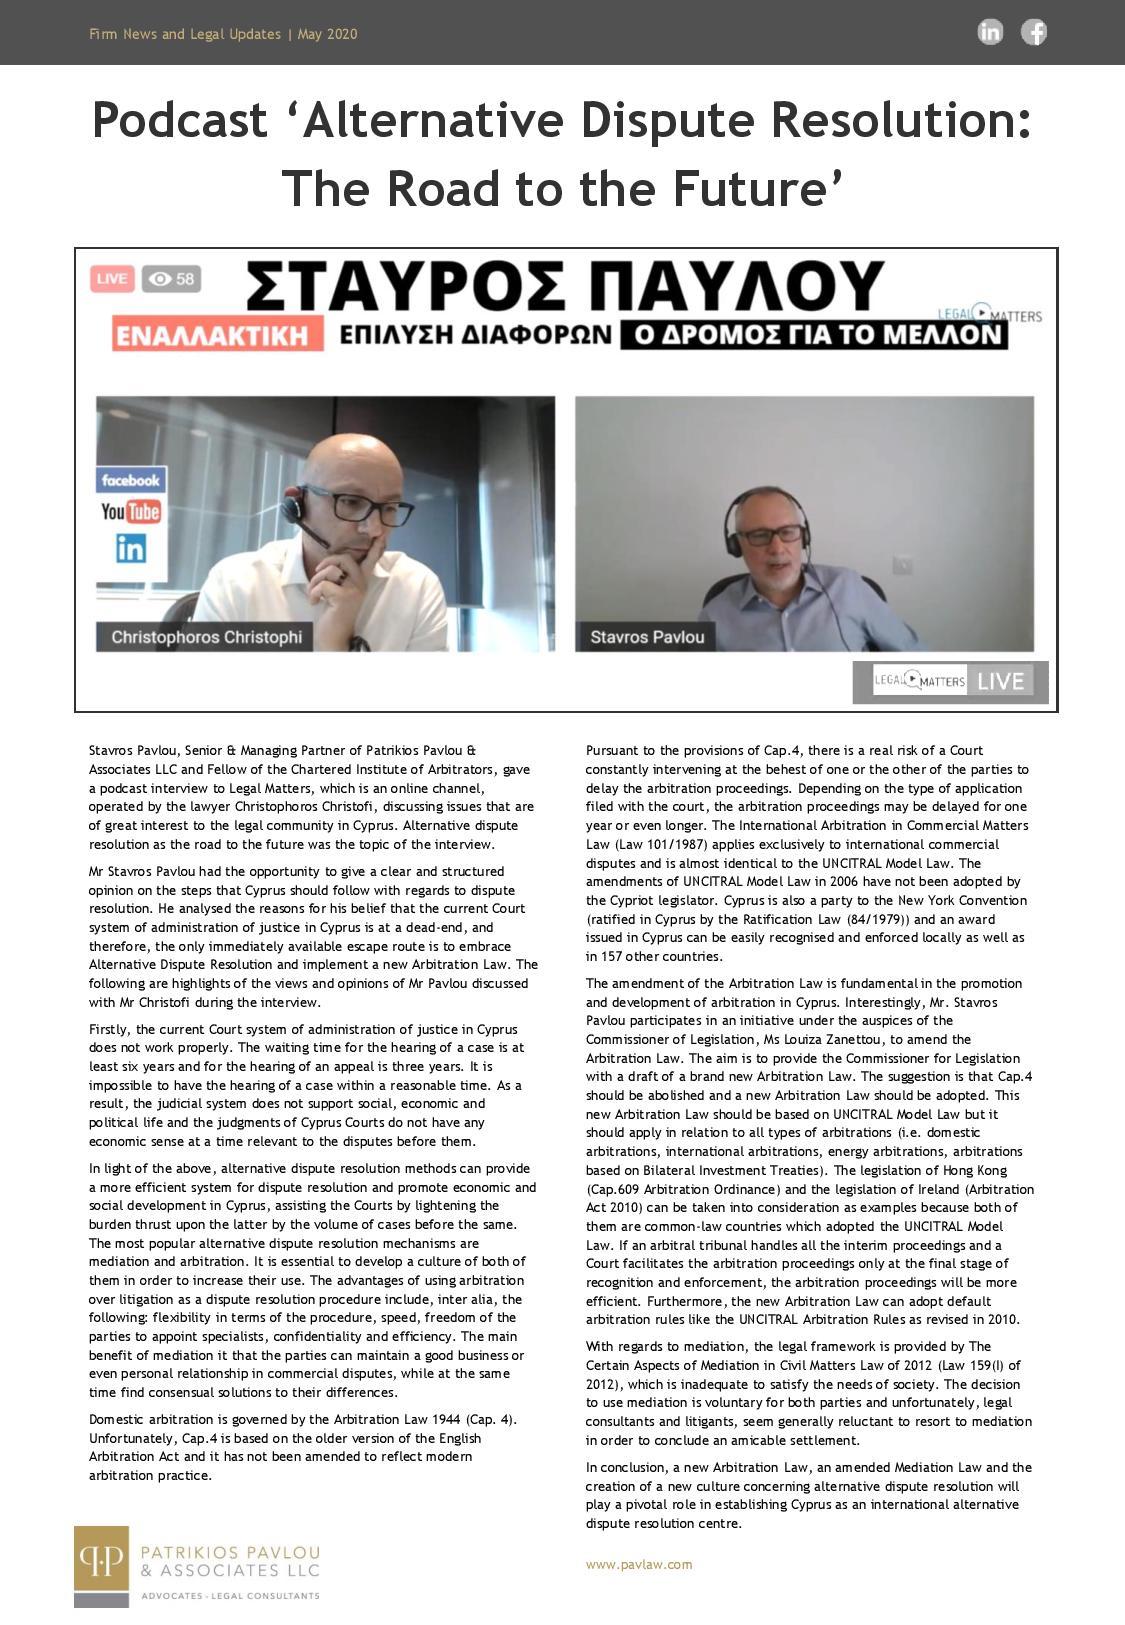 Patrikios Pavlou & Associates LLC: Podcast 'Alternative Dispute Resolution: The Road to the Future'